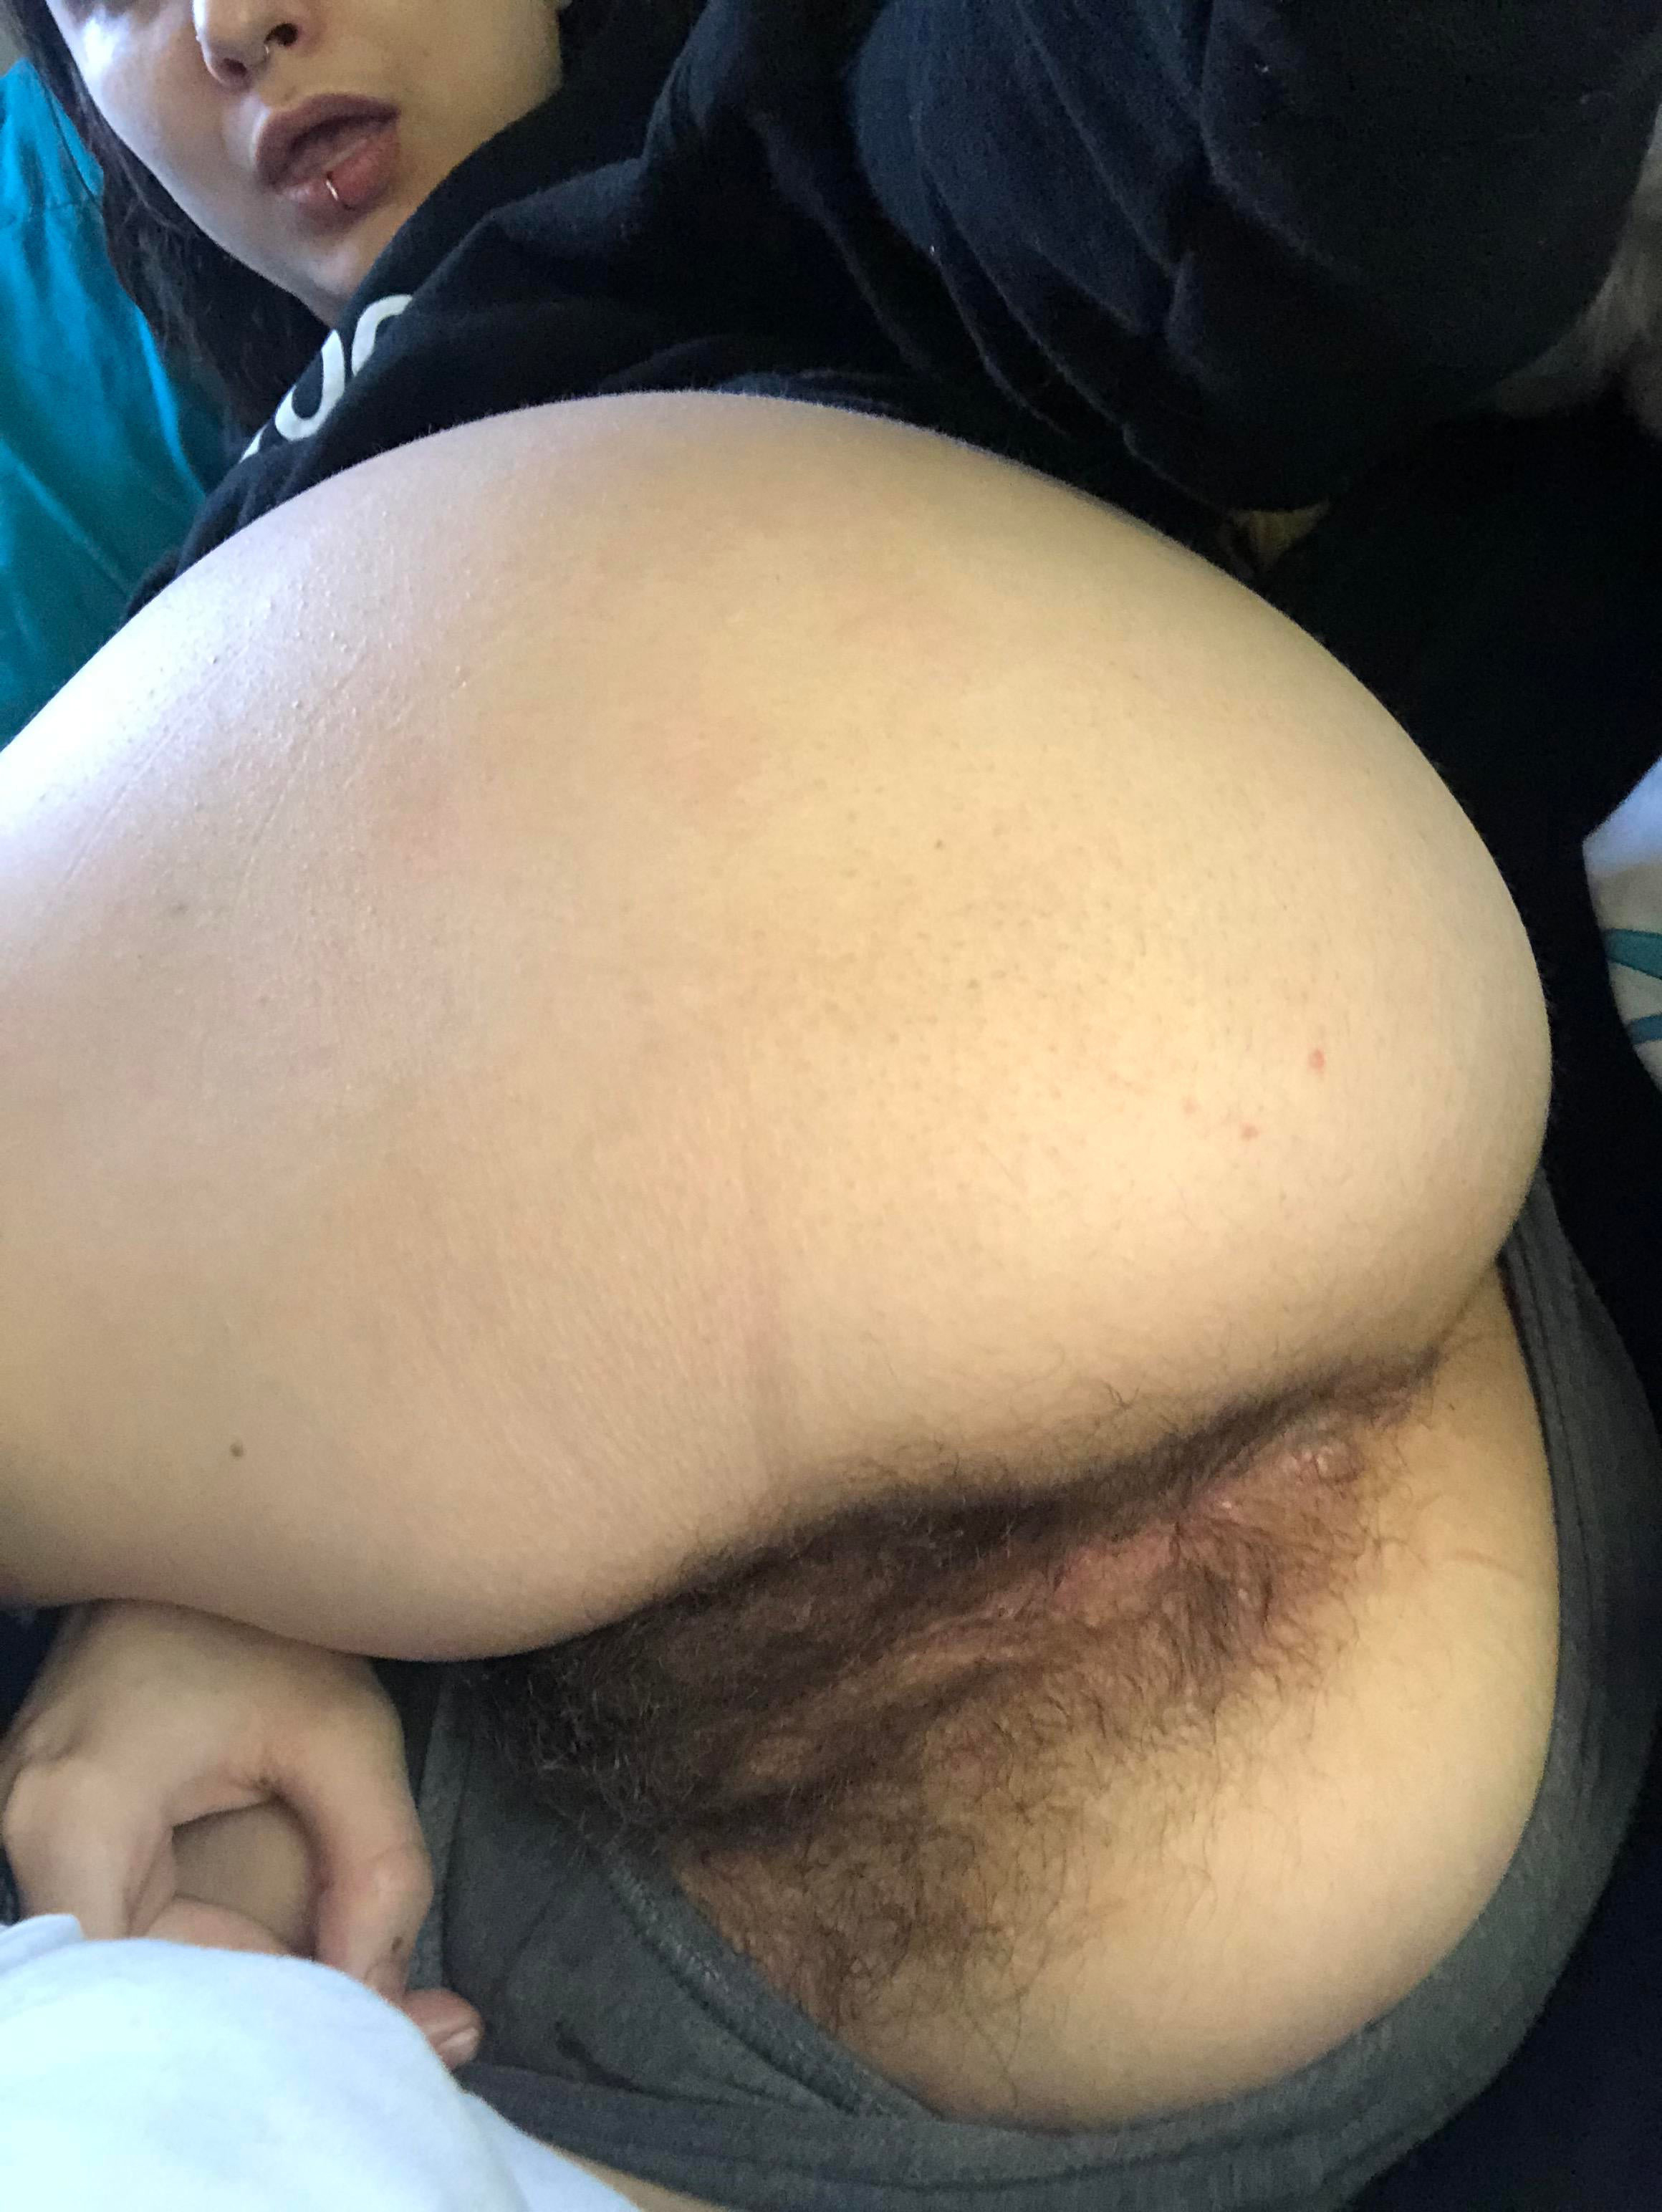 Ass hairy pussy Teen Butts,